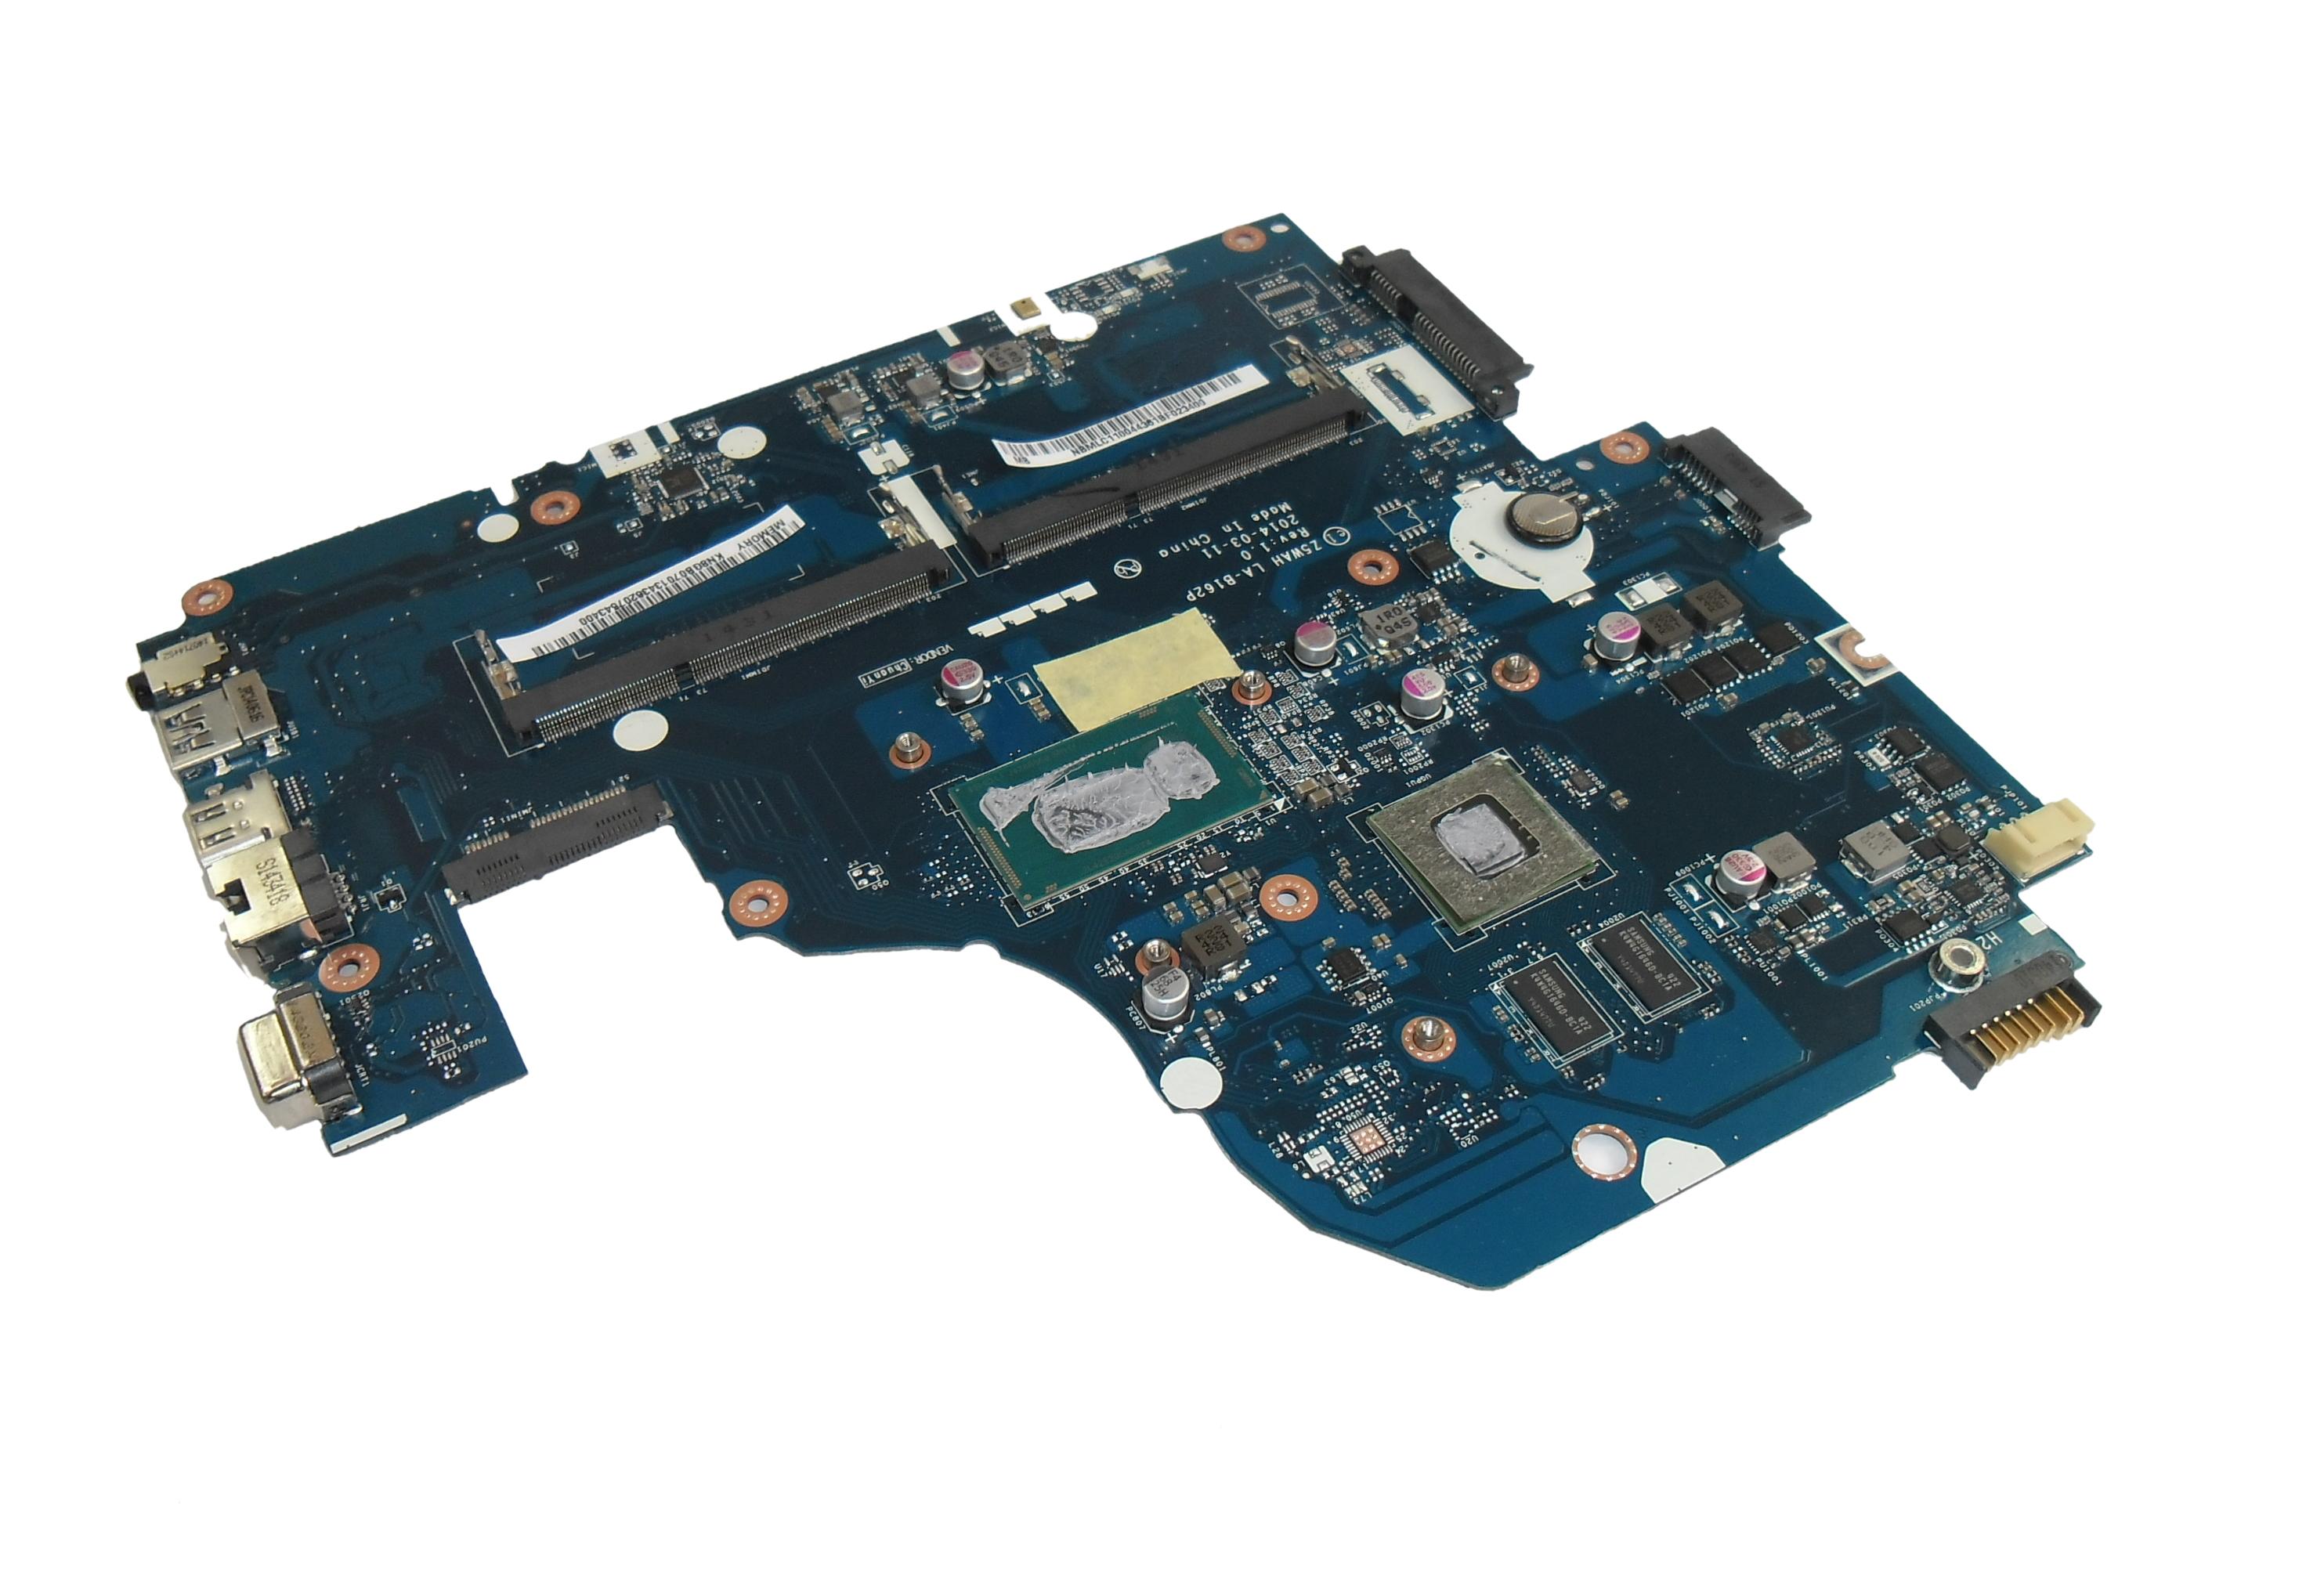 NB.MLC11.004 Acer Aspire V3-572PG-530Y Motherboard with Intel i5-4210U Processor